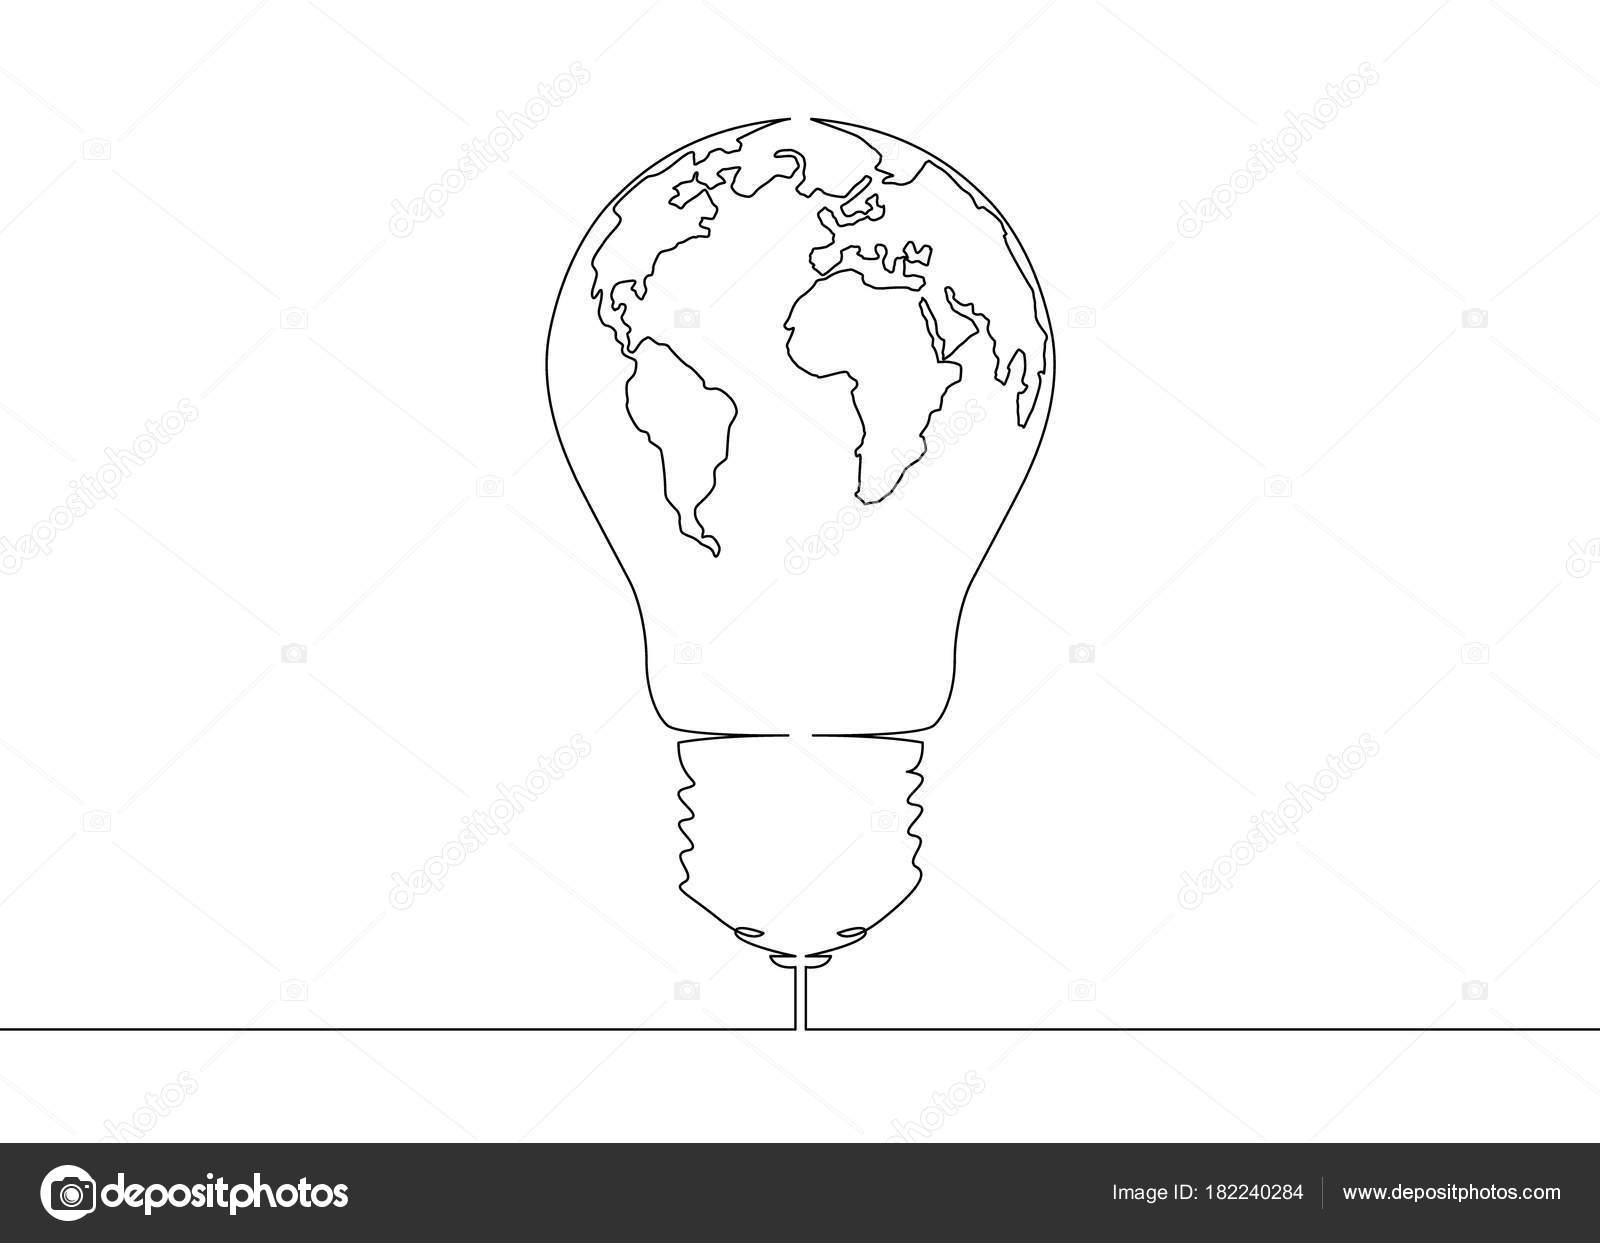 flourescent light symbol